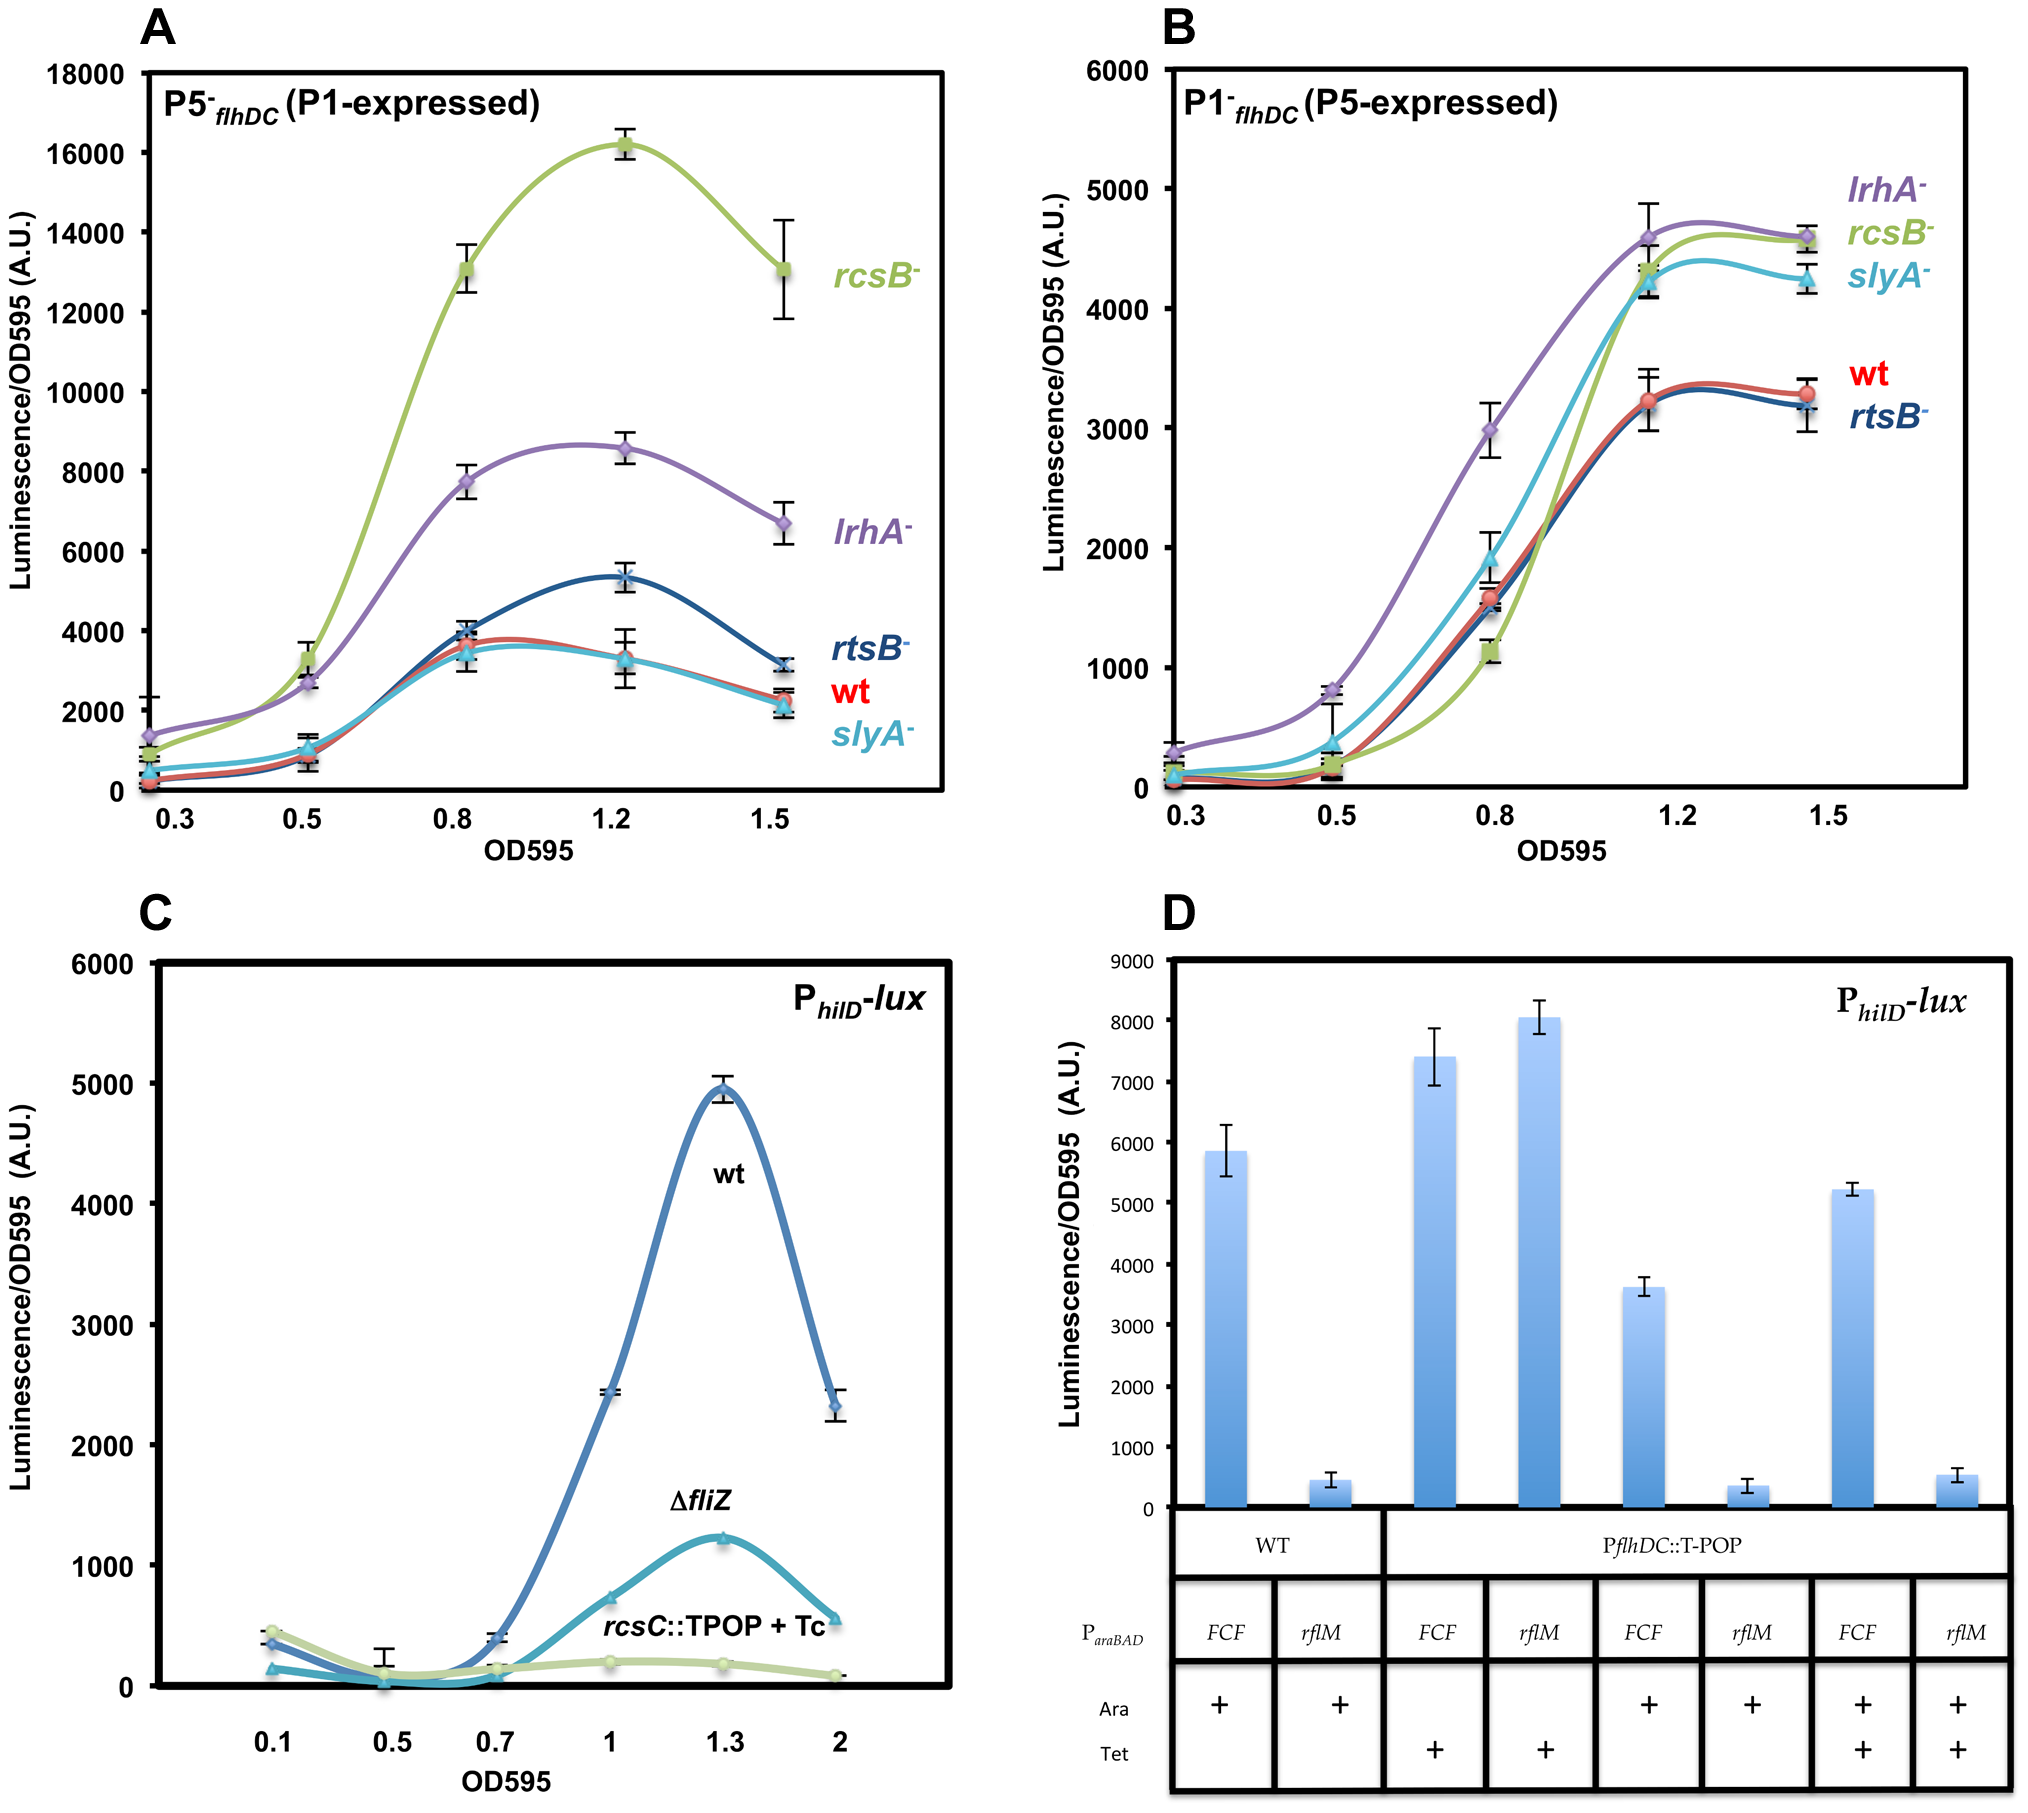 Effects of RcsB, LrhA, RtsB and SlyA on transcription of P1<i><sub>flhDC</sub></i> and P5<i><sub>flhDC</sub></i>.